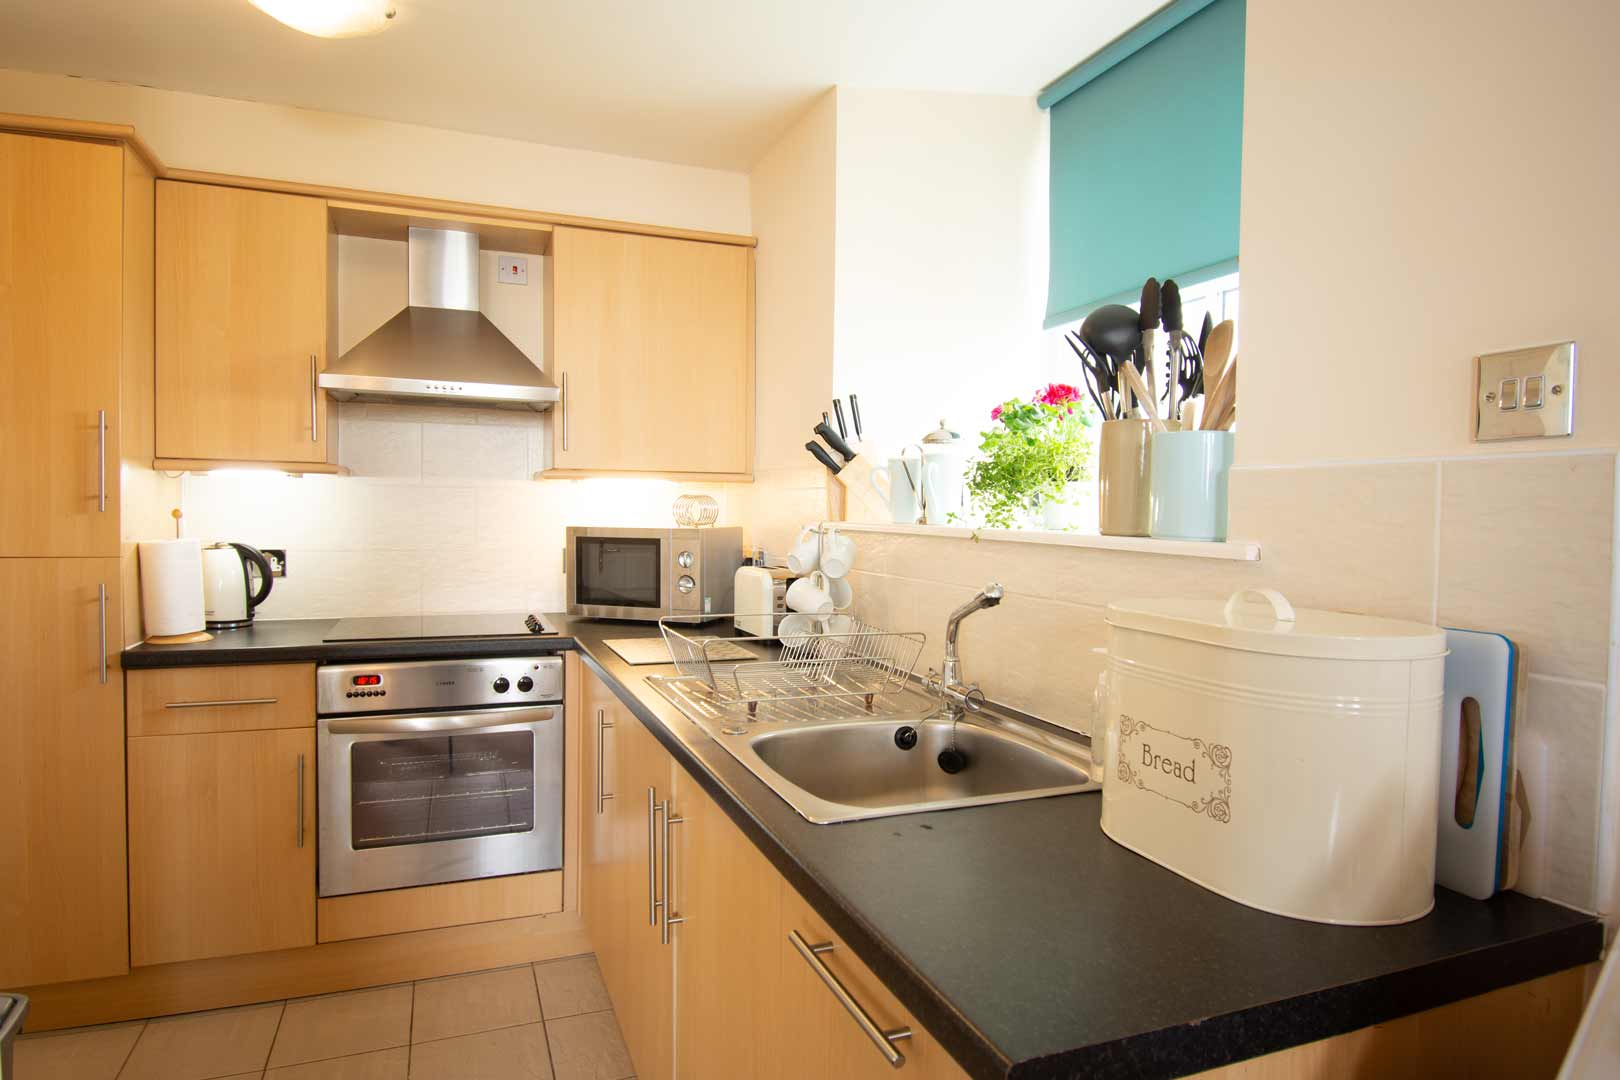 Kilchoman apartment: fully equipped kitchen